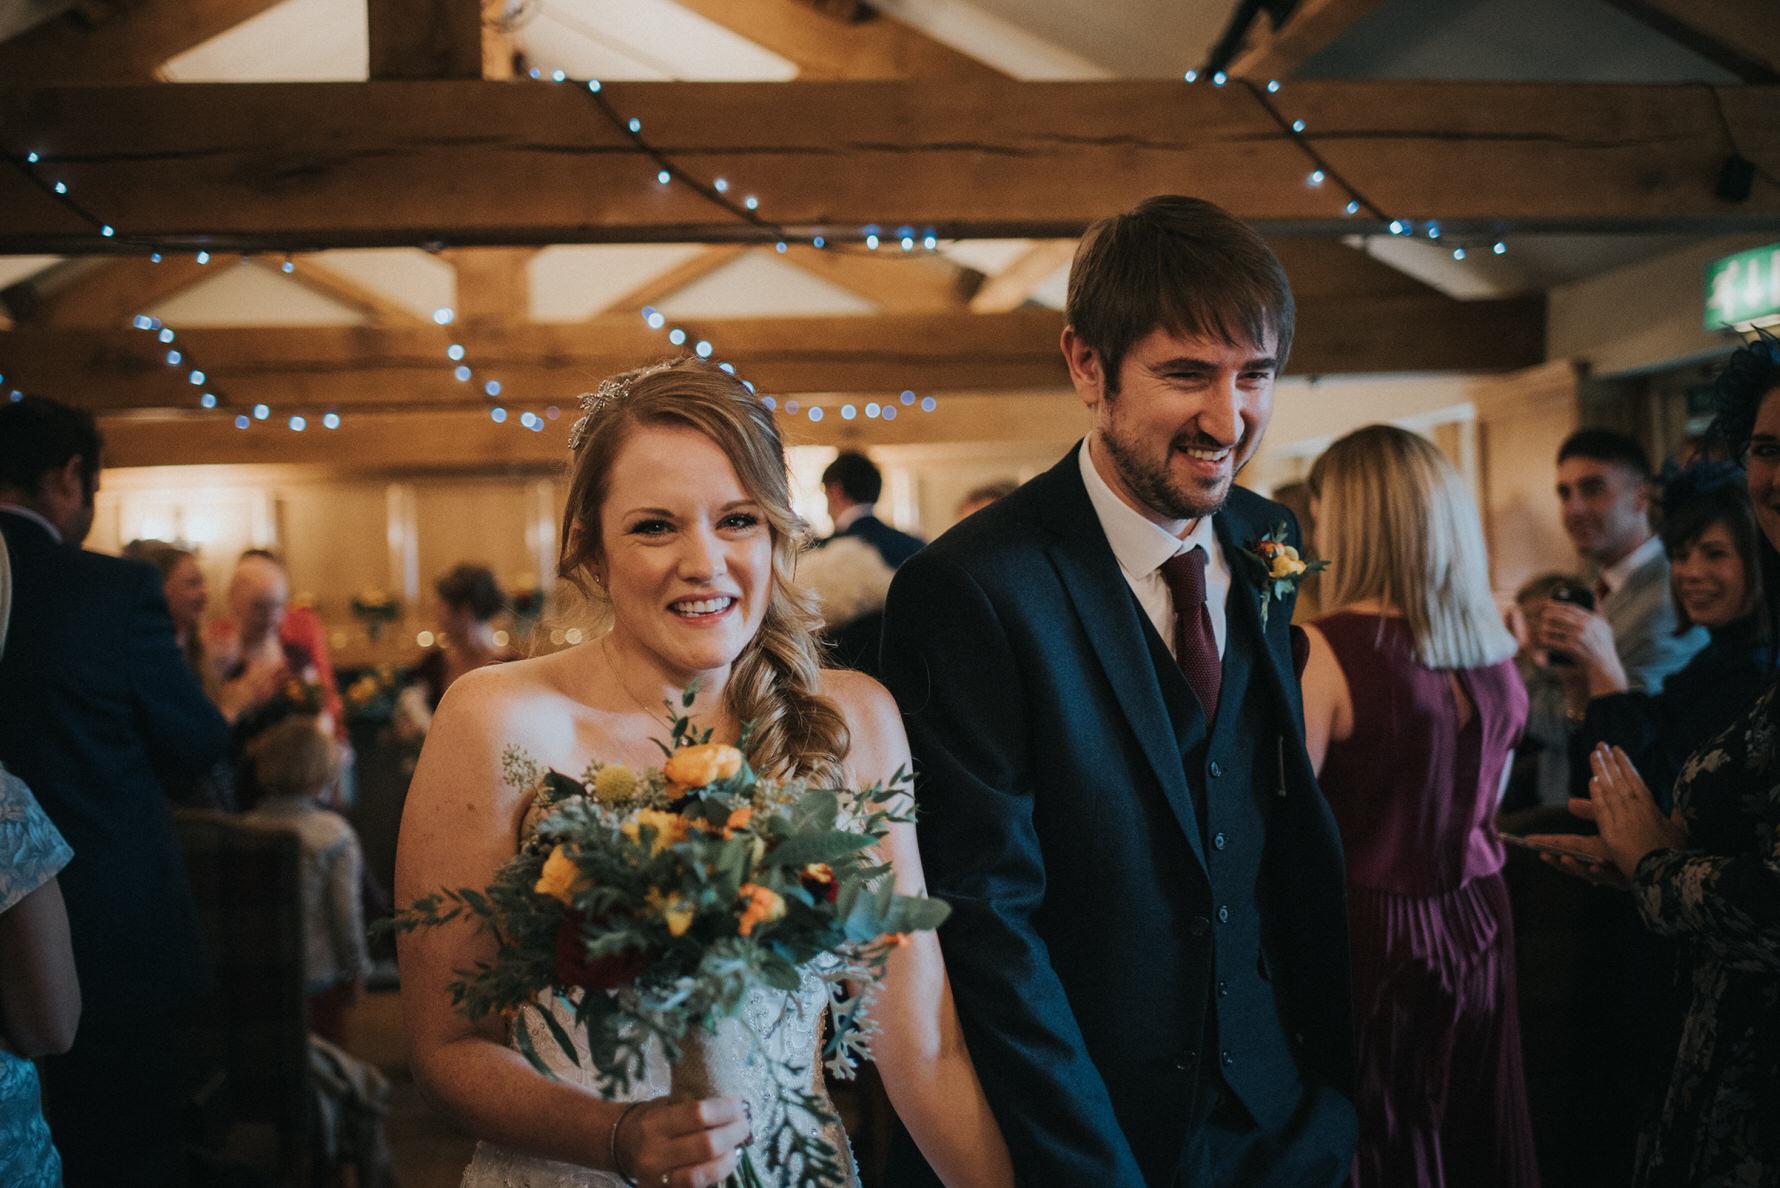 Cheshire Documentary Wedding Photography in Burnsall, Yorkshire Dales